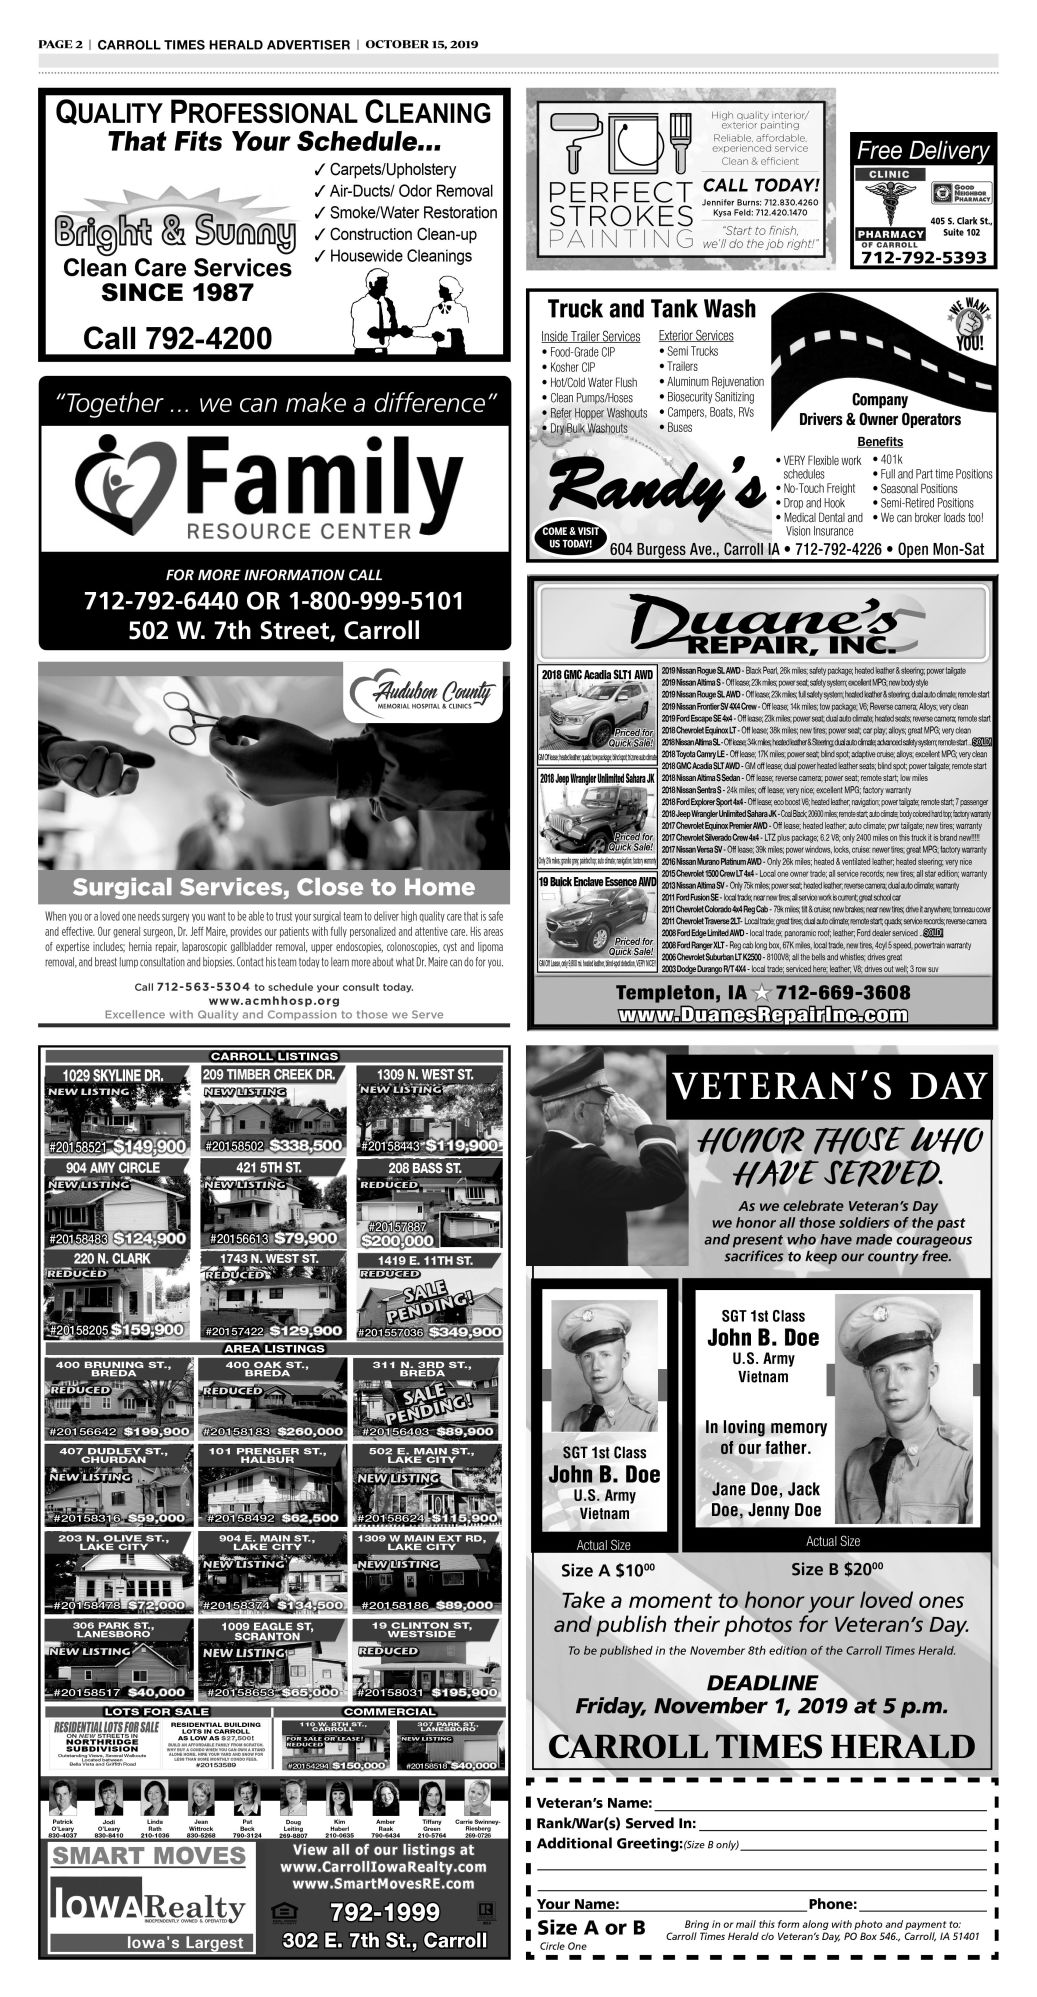 10-15 ADV Page 02.jpg